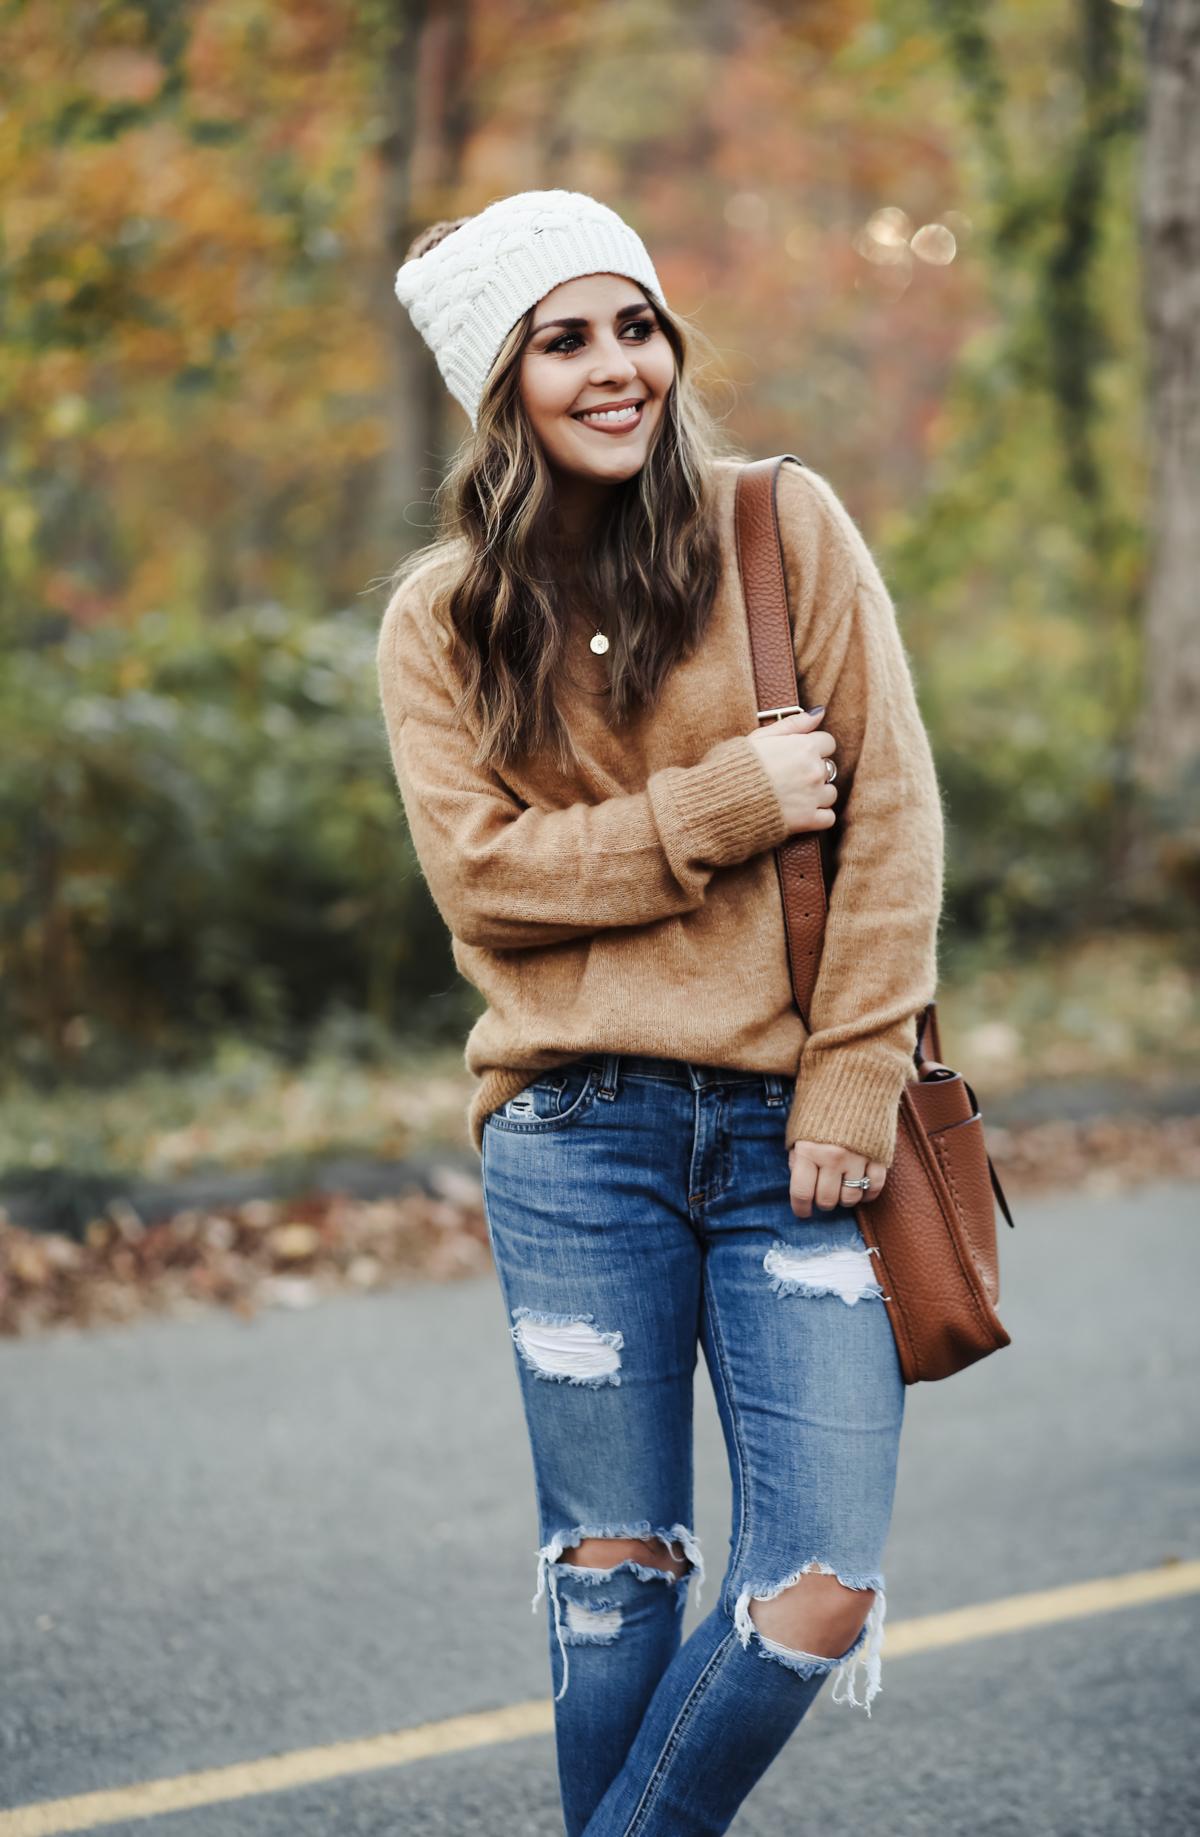 oversized camel color sweater with white pom beanie-2 - dress cori lynn 09e82b6c359